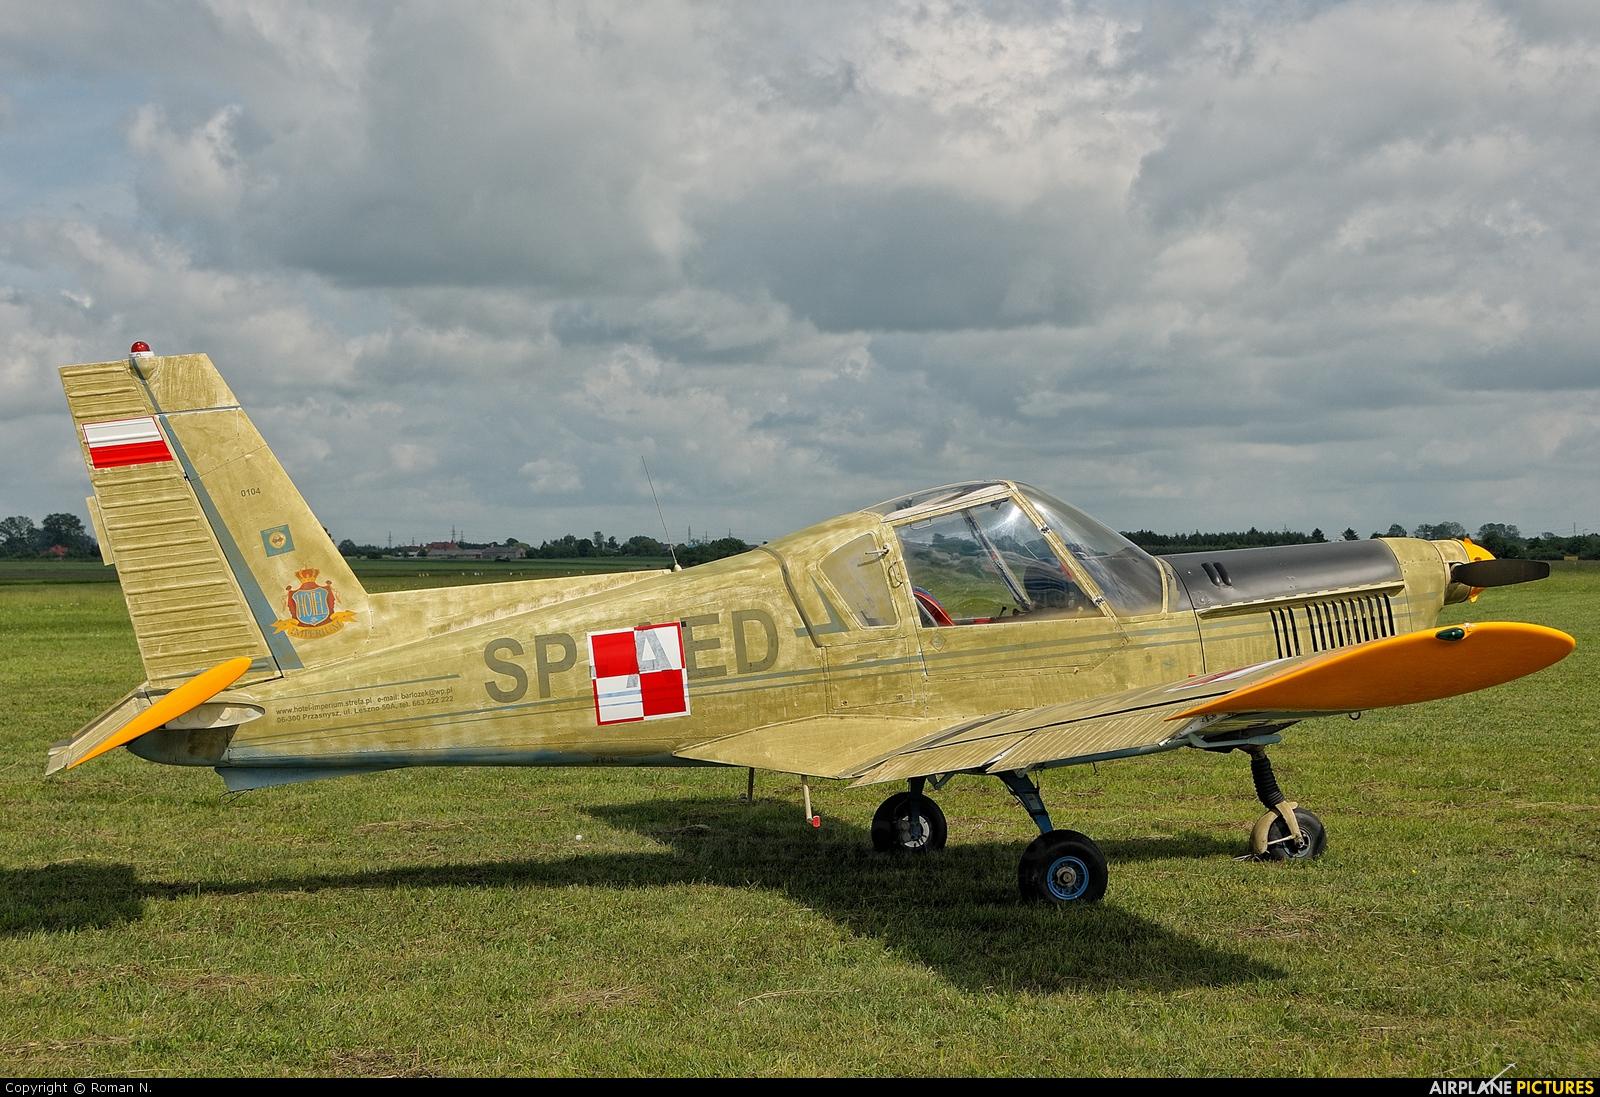 Aeroklub Słupski SP-AED aircraft at Płock